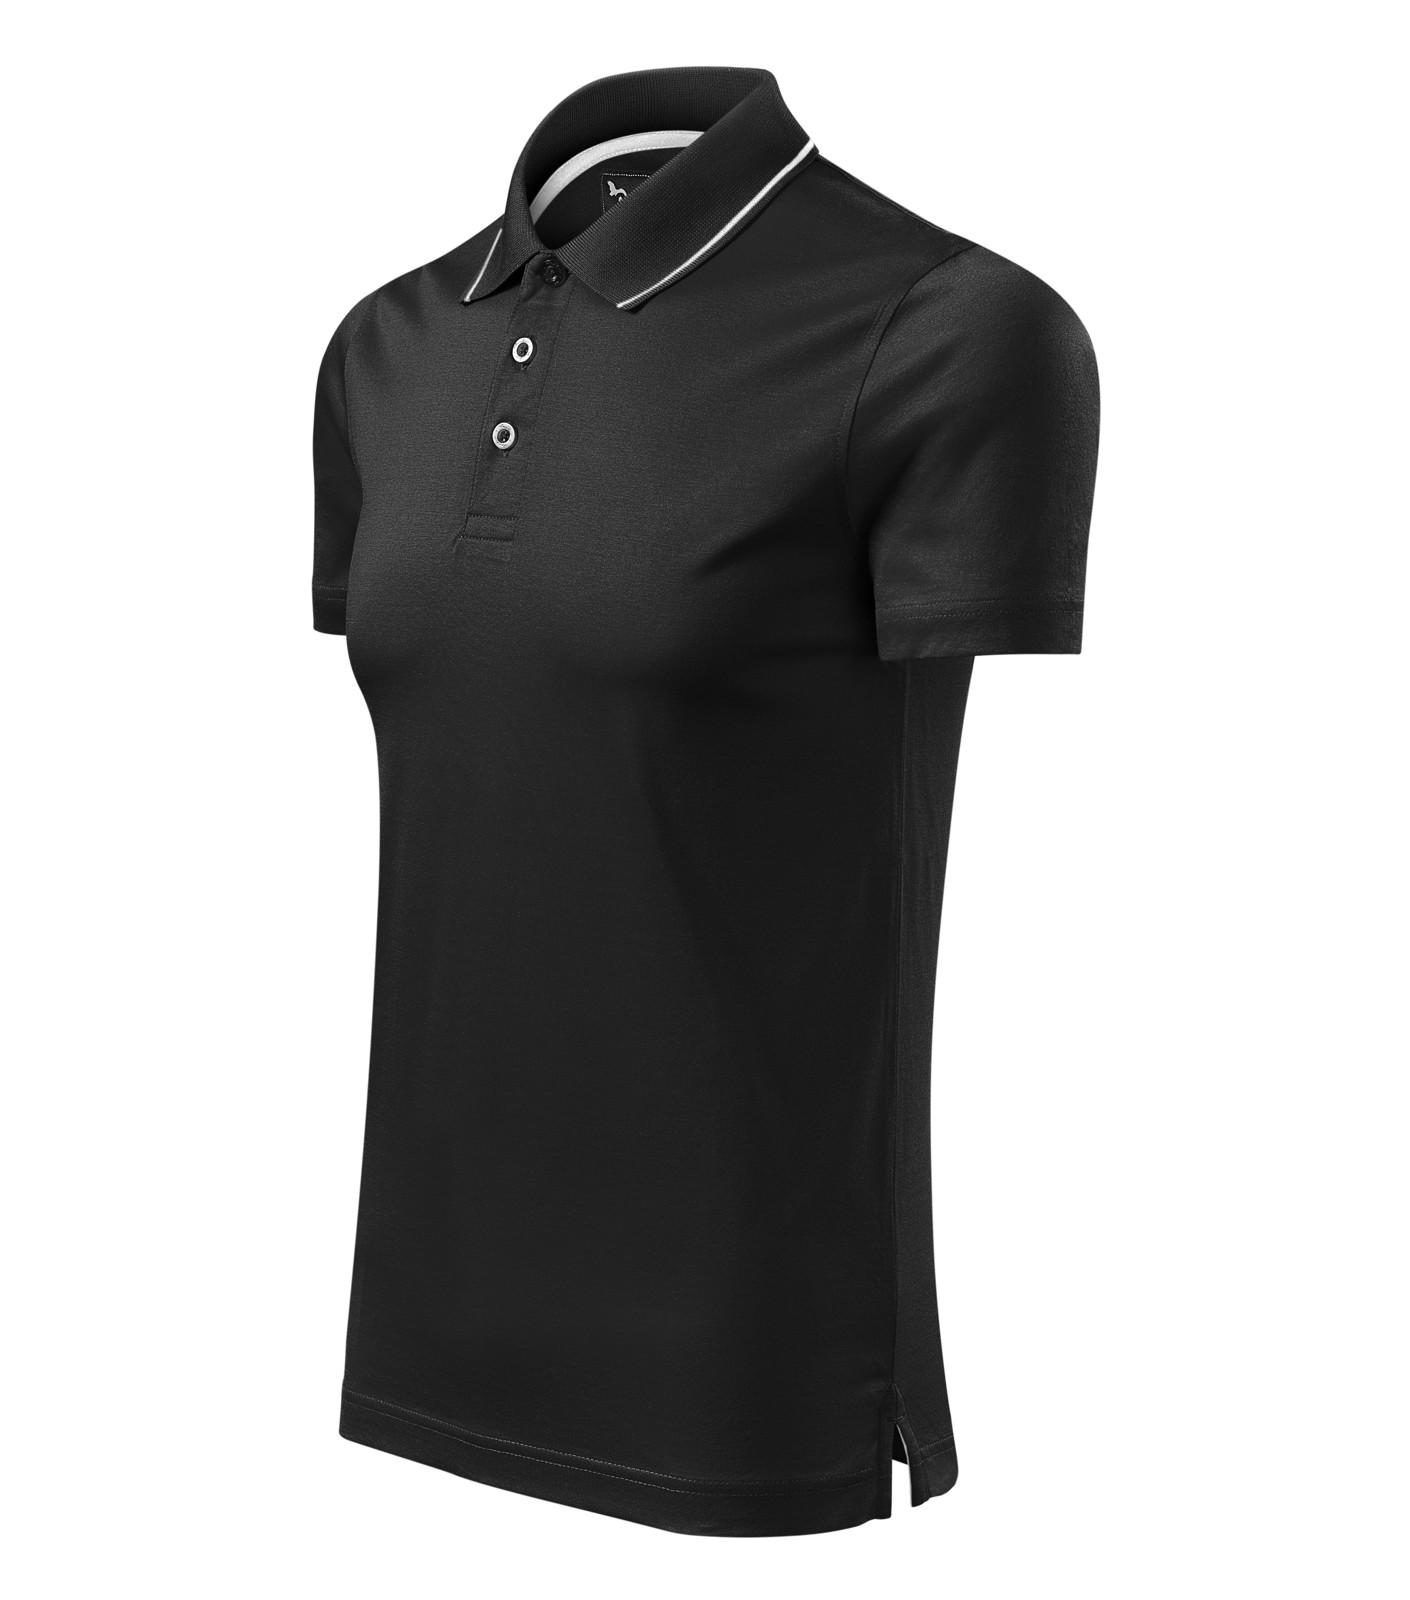 Polo Shirt men's Malfinipremium Grand - Black / 2XL